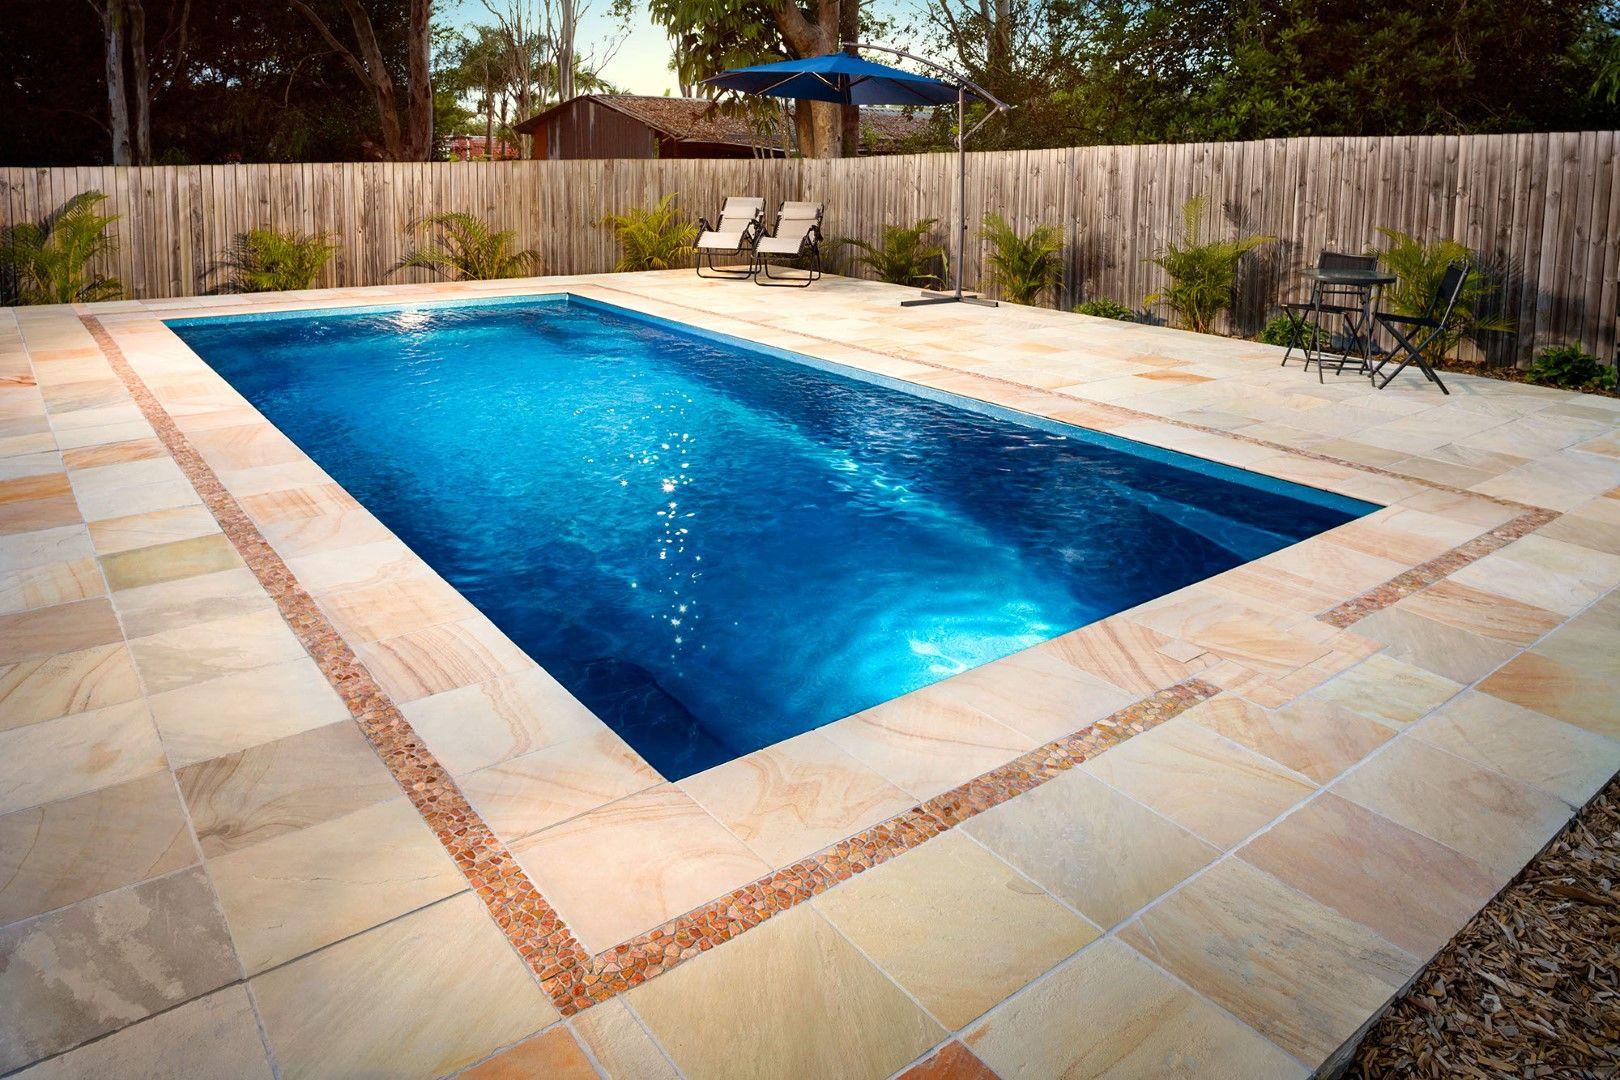 Pools By Freedom Pools Australia S Most Awarded Pool Manufacturer Cool Swimming Pools Backyard Pool Designs Fiberglass Pools